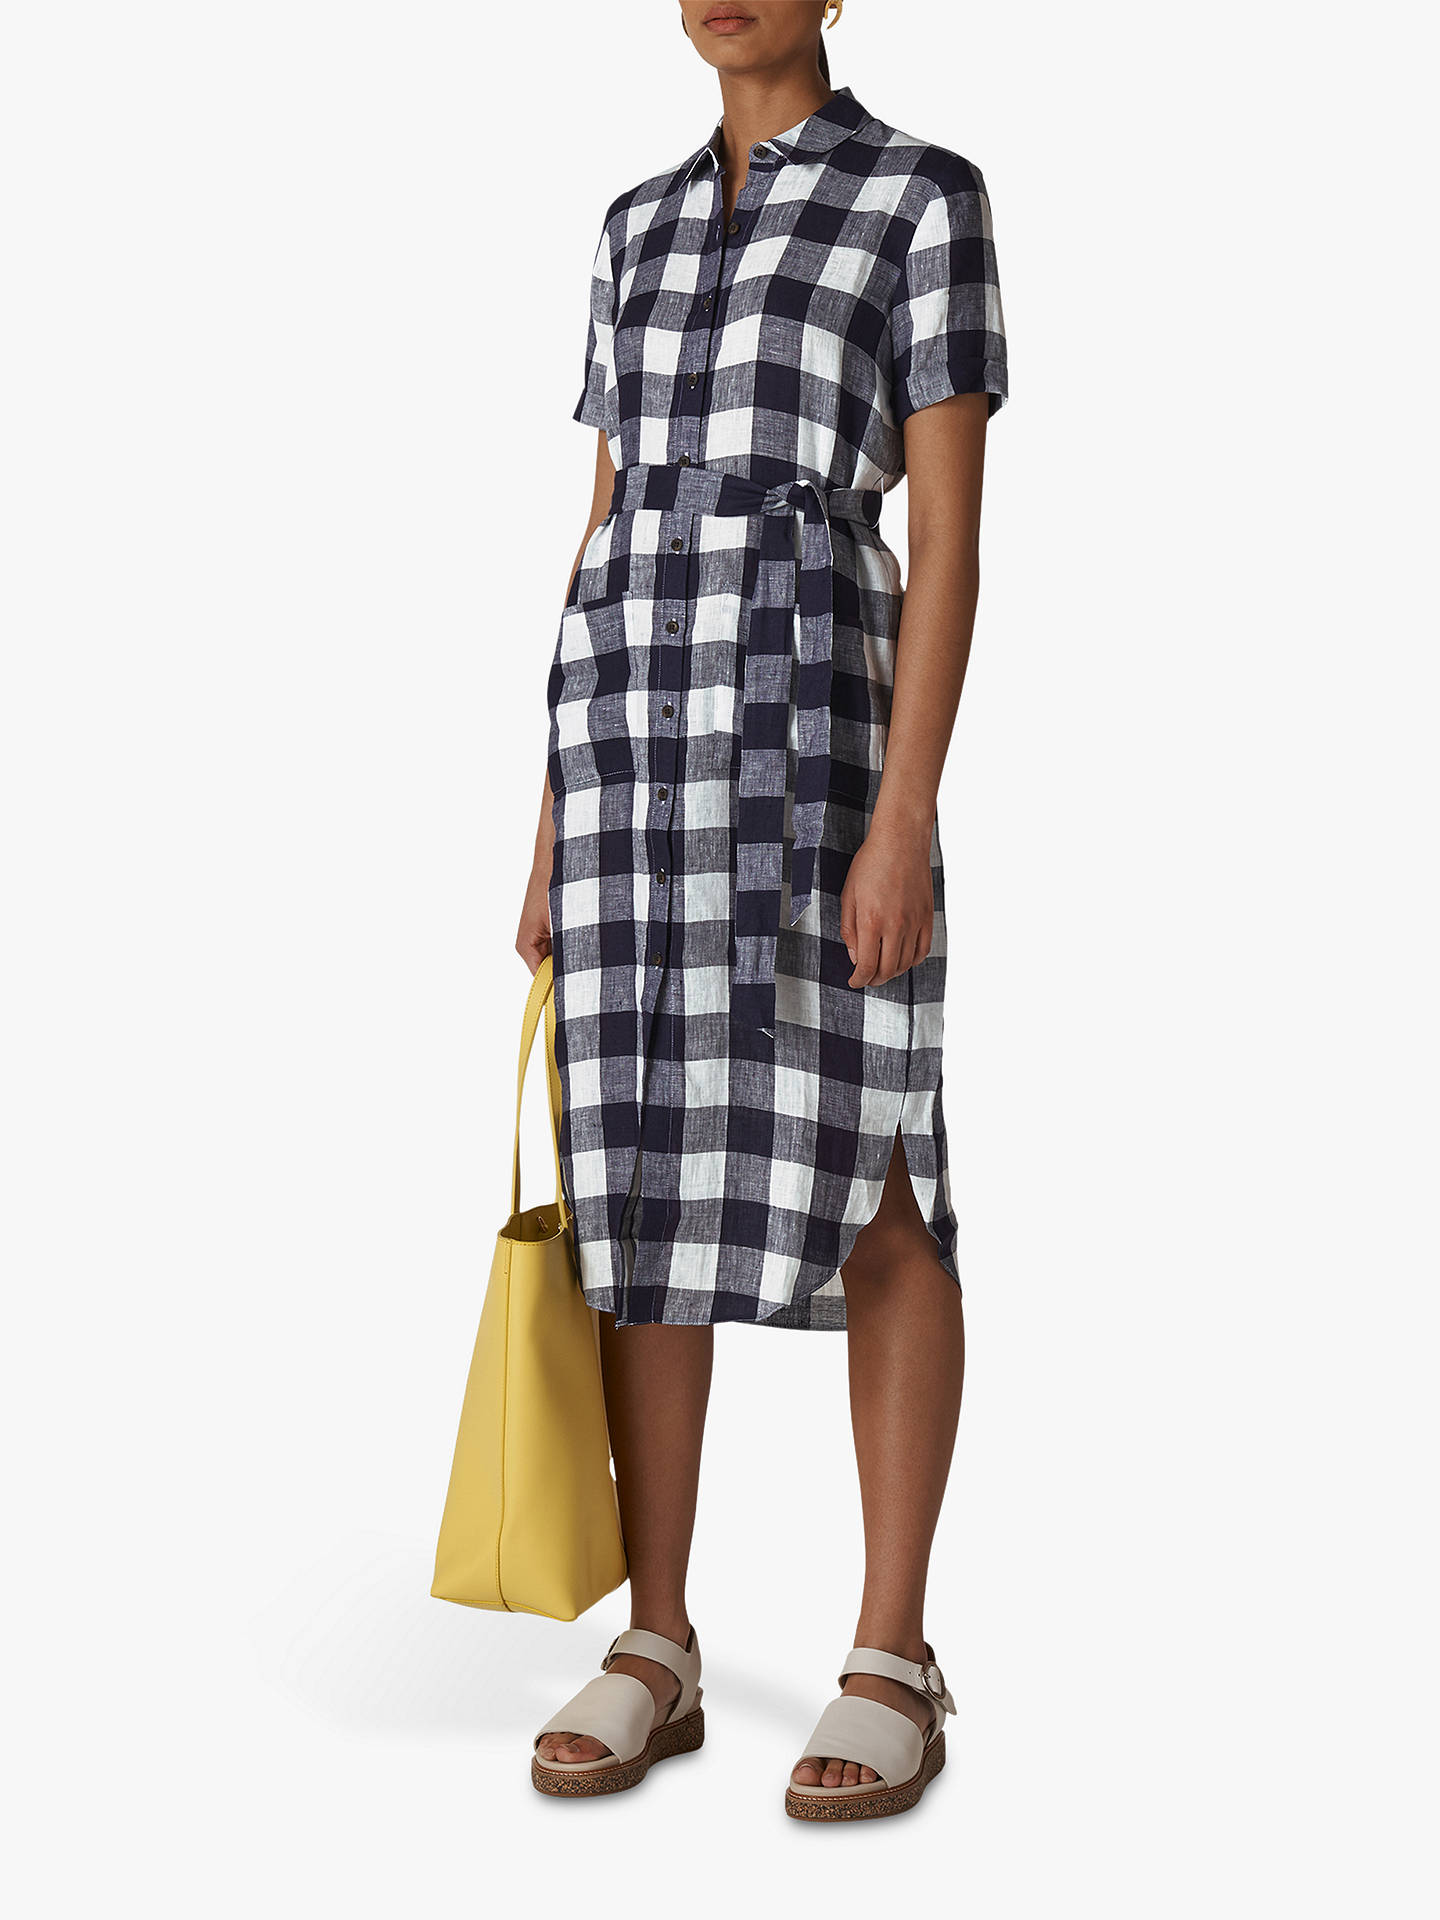 0bec1329b28 Buy Whistles Montana Gingham Shirt Dress